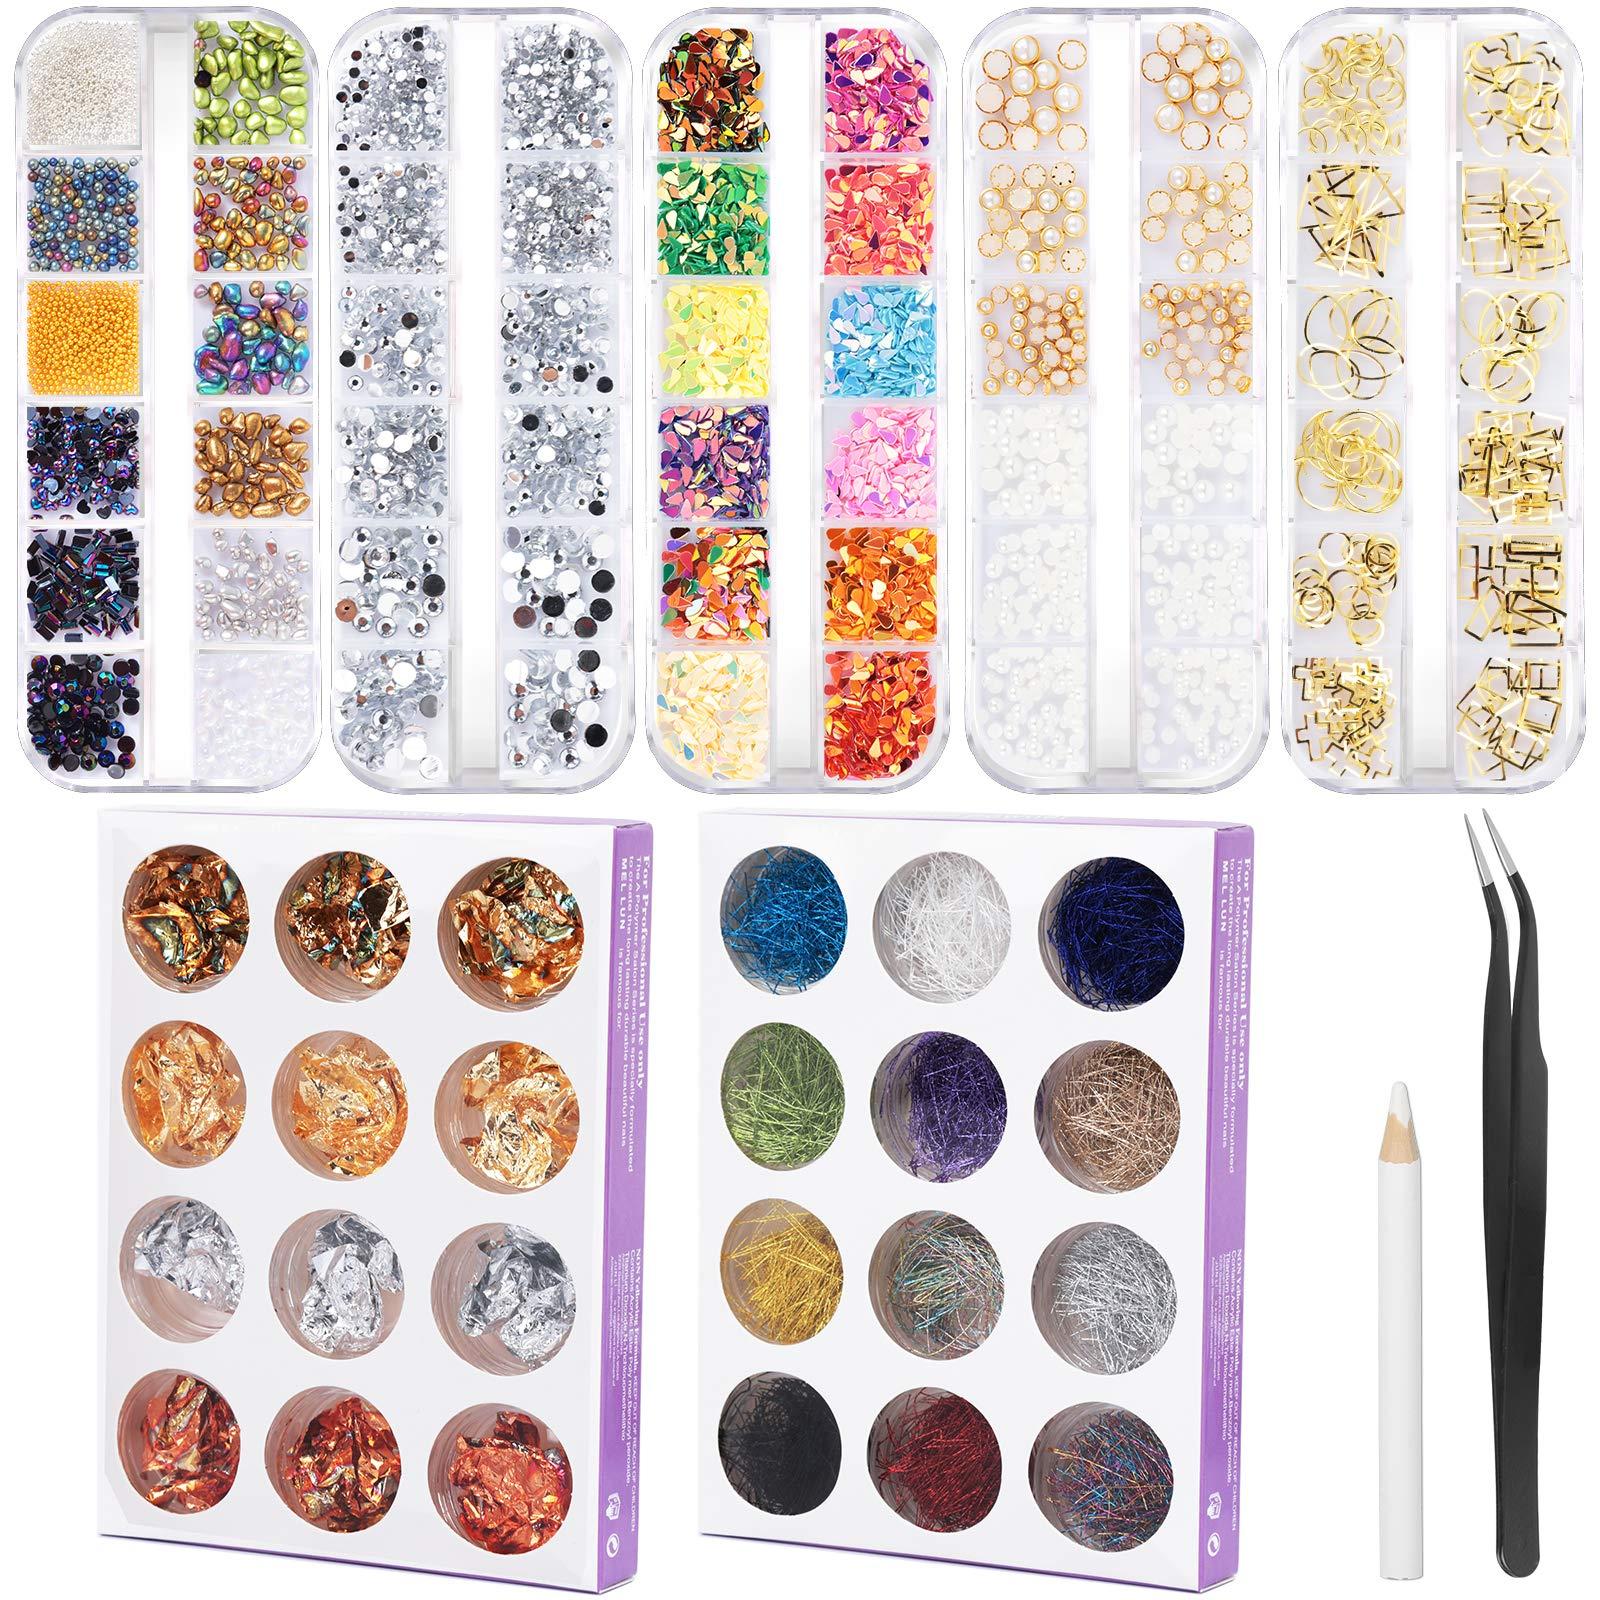 FANDAMEI Nail Art Kit with Nail Gems & Nail Foils - 5 Boxes Nail Decoration Accessories, 12 Boxes Nail Art Foils, 12 Boxes Nail Thread, Tweezer and Dotting Pen, Nail Rhinestones Crystal for Gel Nails